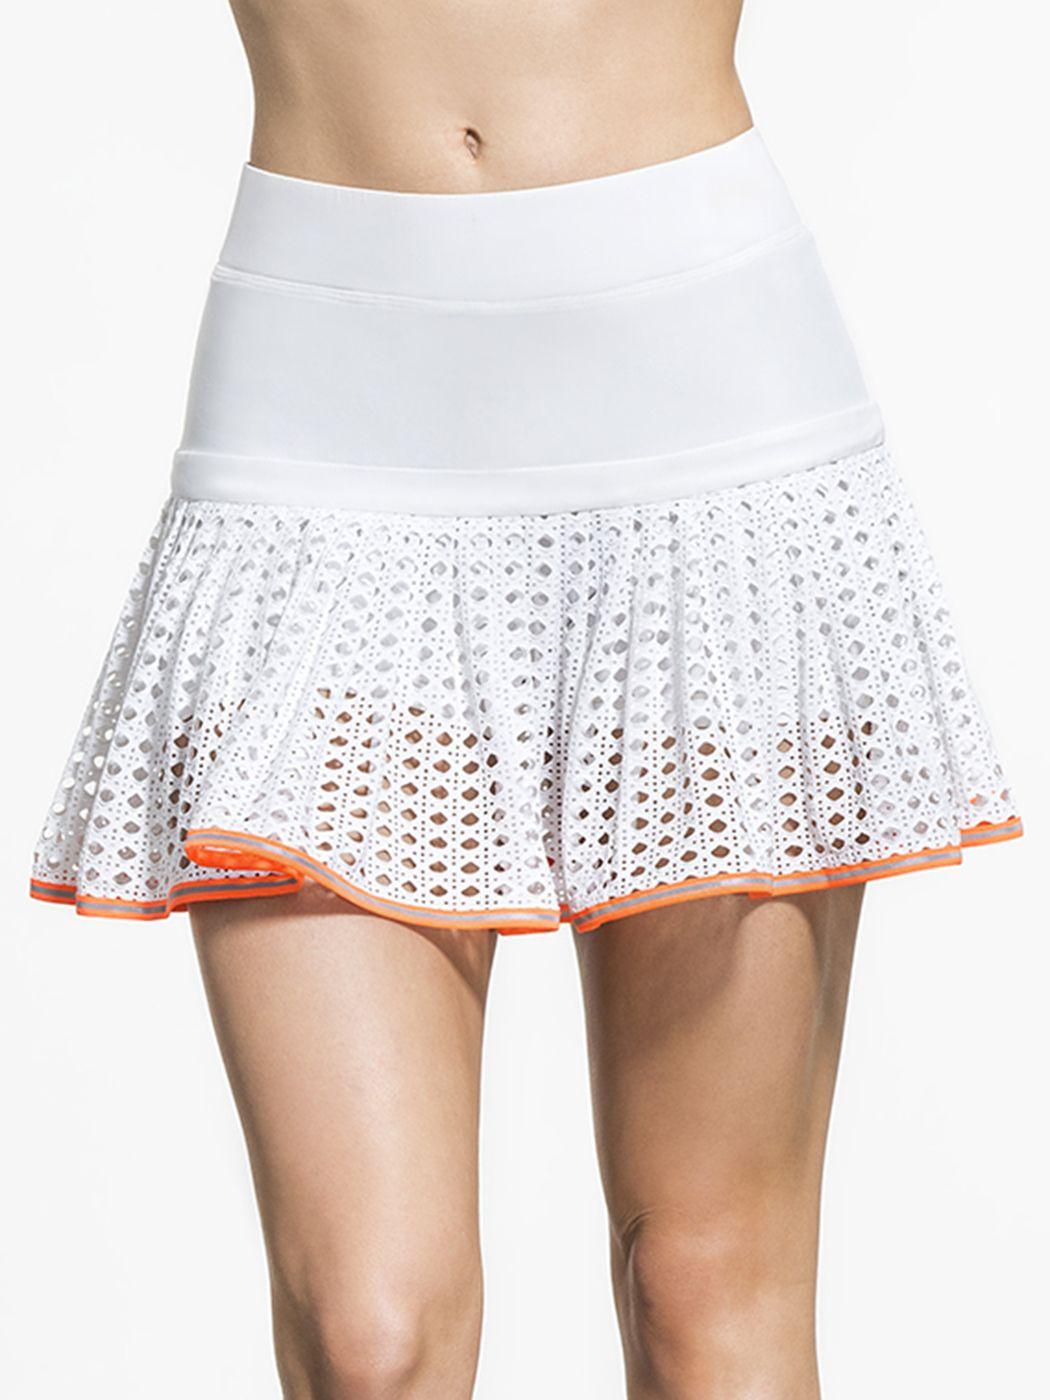 Pointelle Mesh Lace Tennis Skort In White Lace Orange By L Etoile From Carbon38 Tennis Dress Tennis Skort Tennis Clothes [ 1400 x 1050 Pixel ]